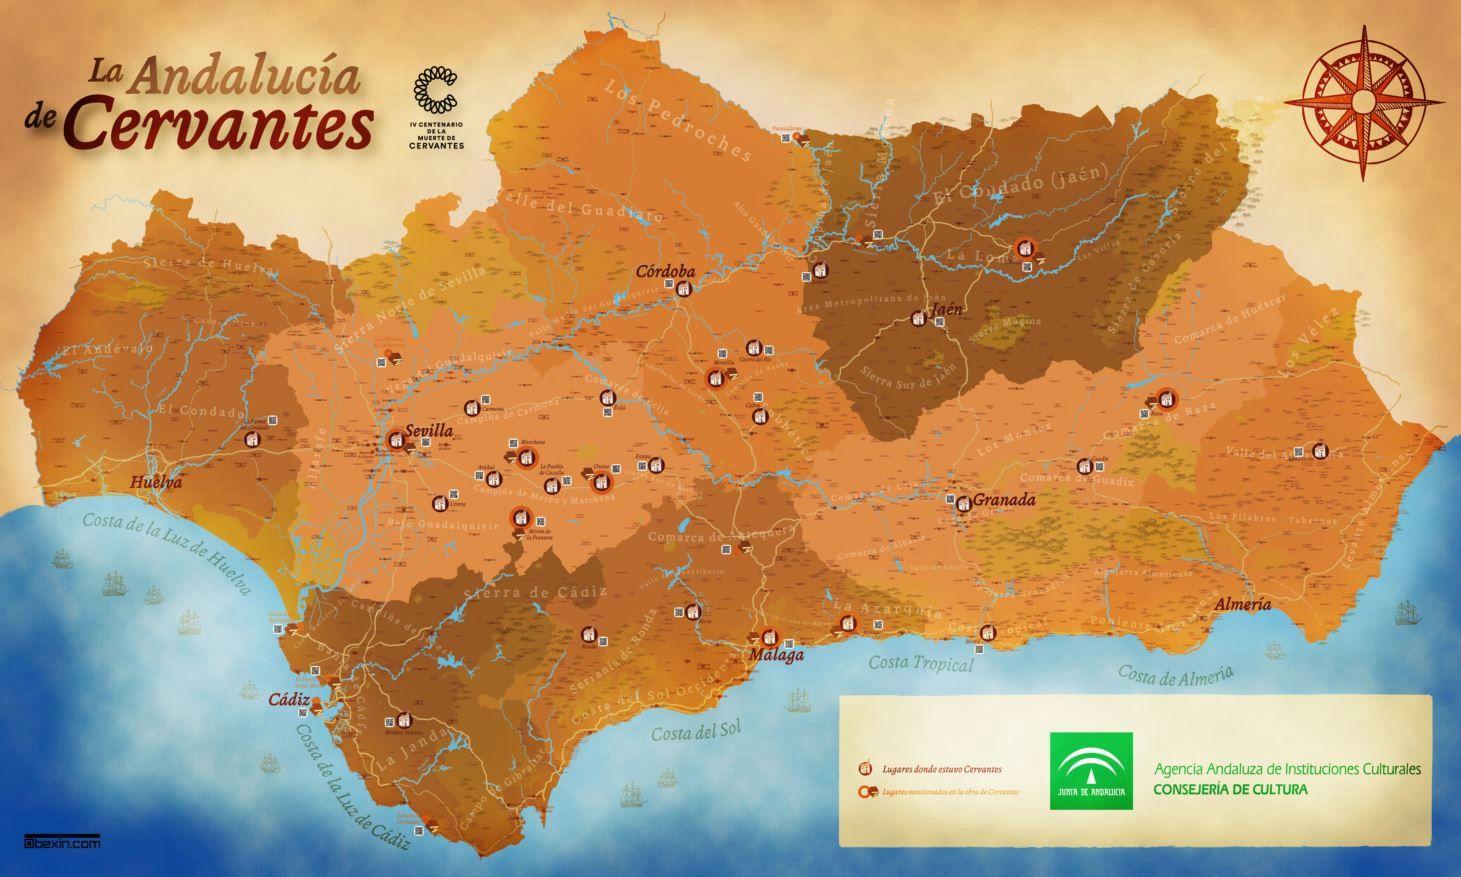 La Andalucía de Cervantes